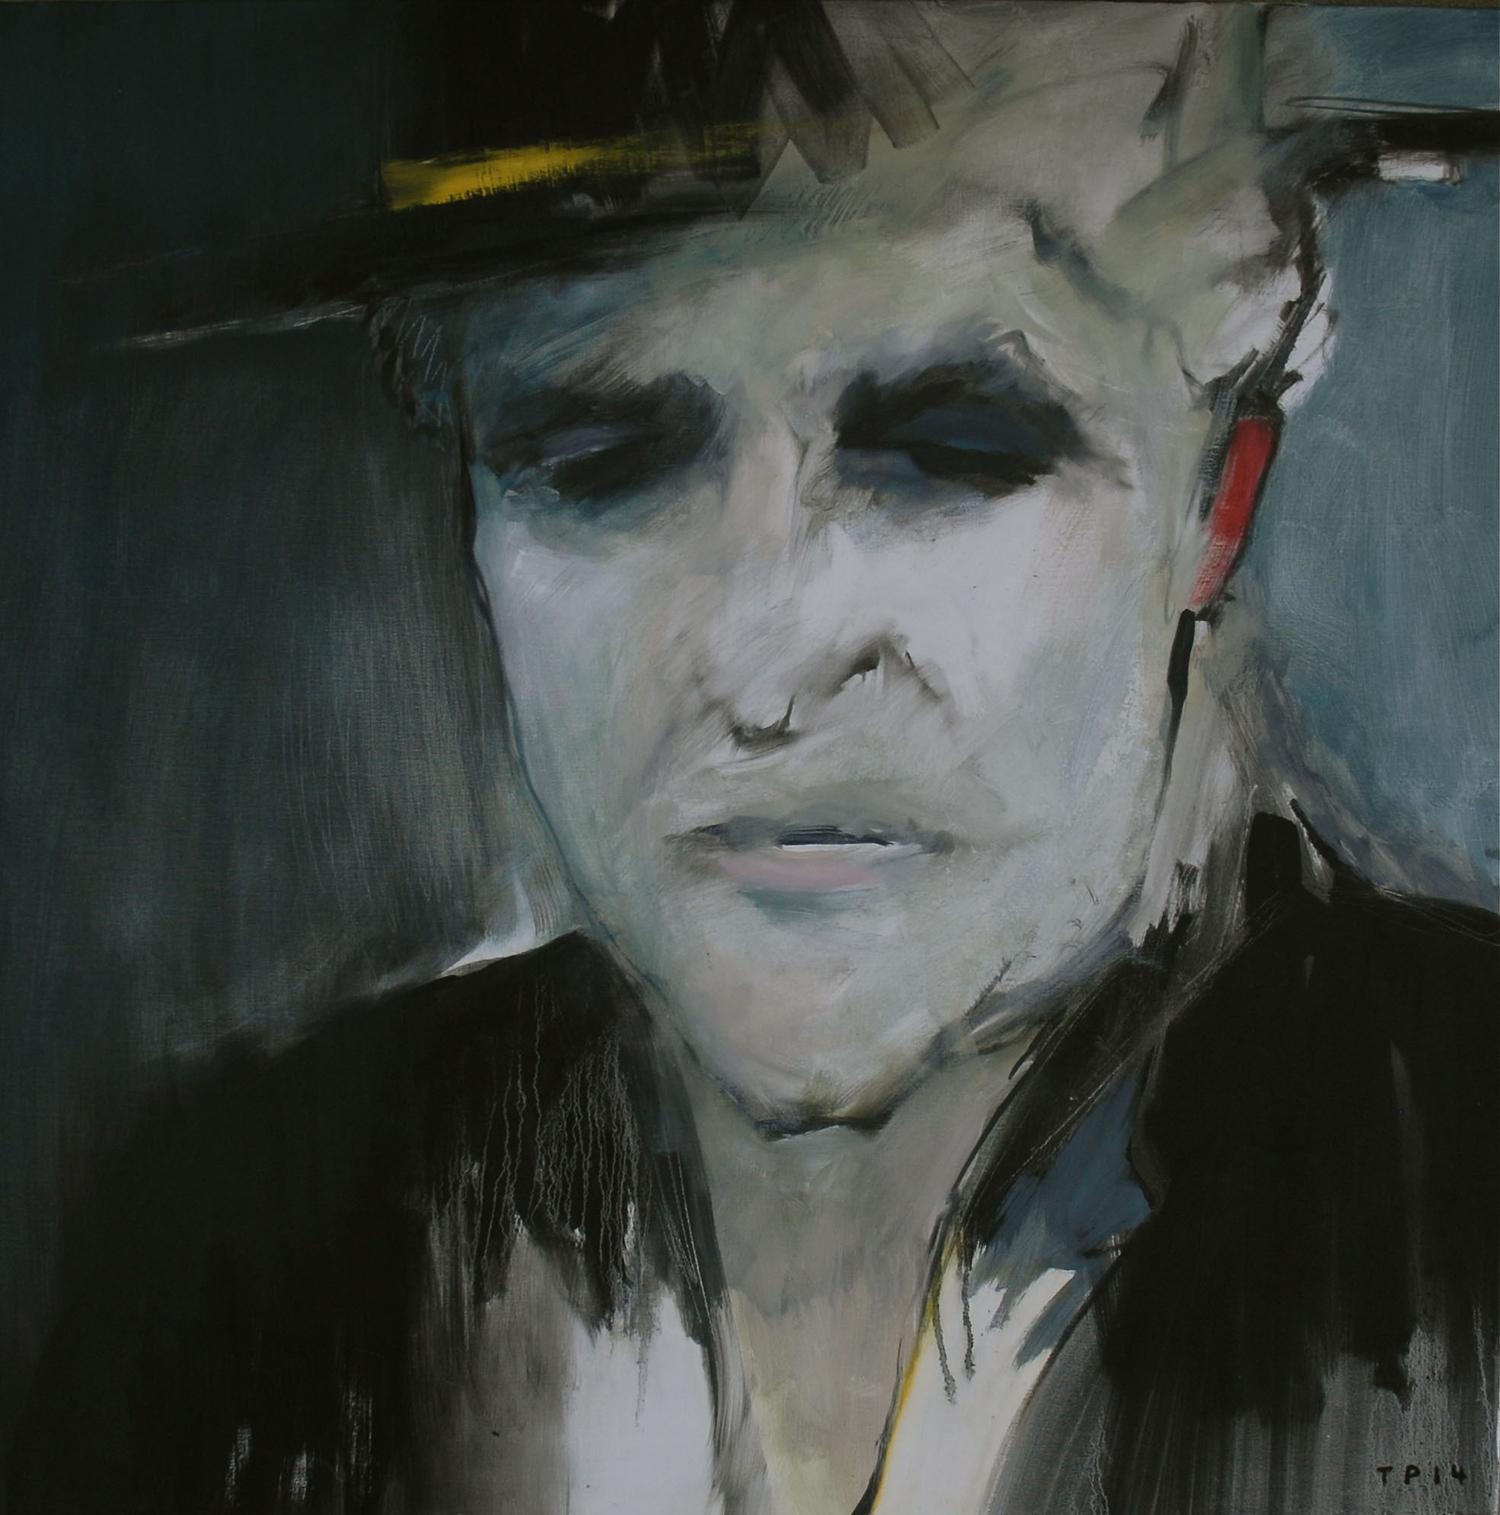 MAN WEARING A BLACK HAT